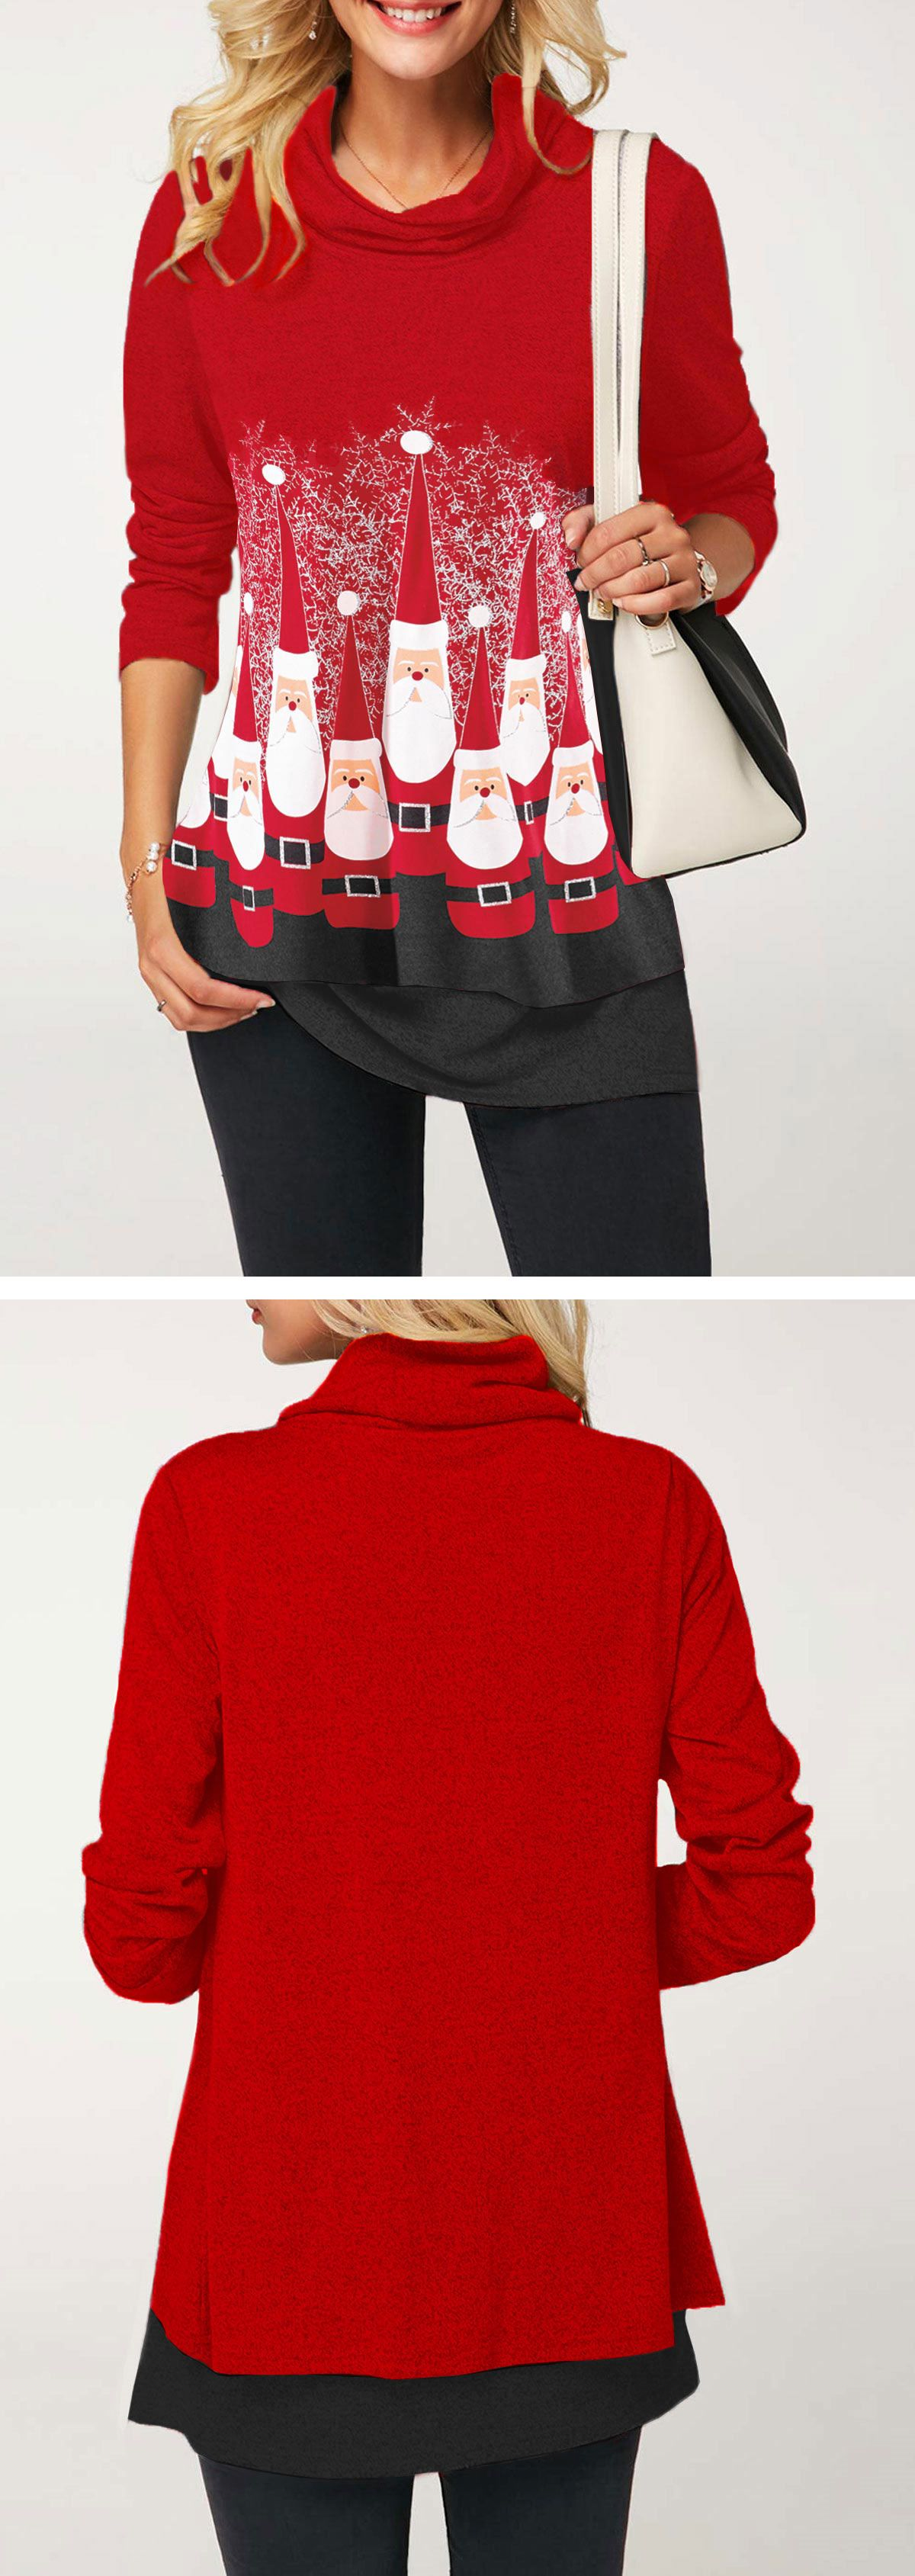 Long sleeve santa claus print red t shirt in christmas